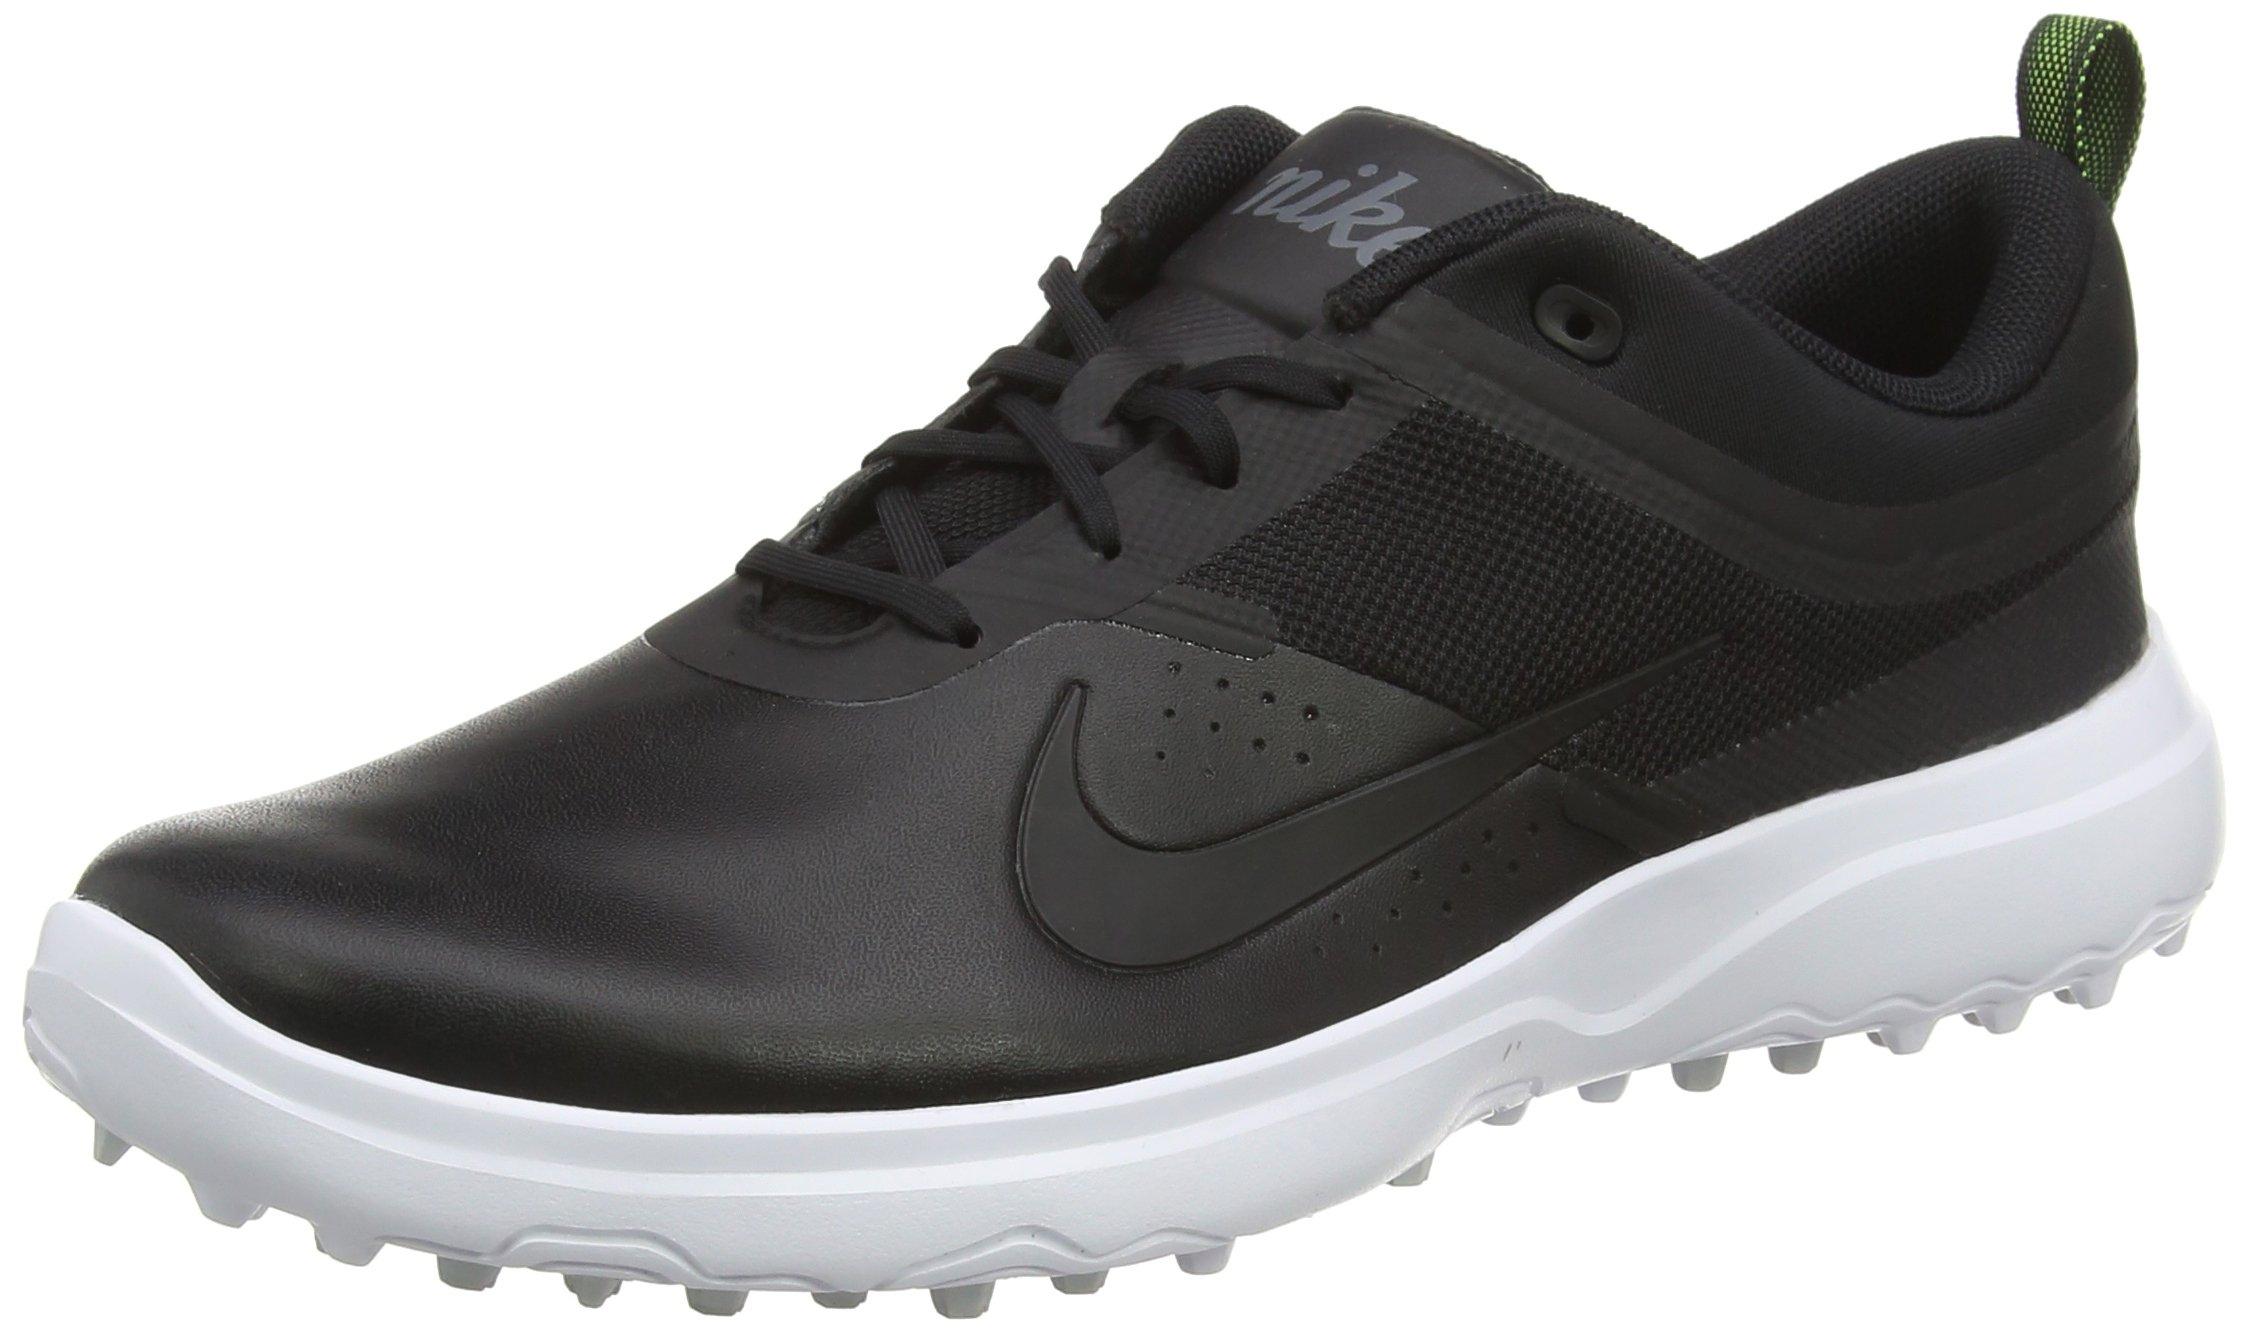 Nike AKAMAI Spikeless Golf Shoes 2017 Women Black/White/Pure Platinum/Black Medium 6.5